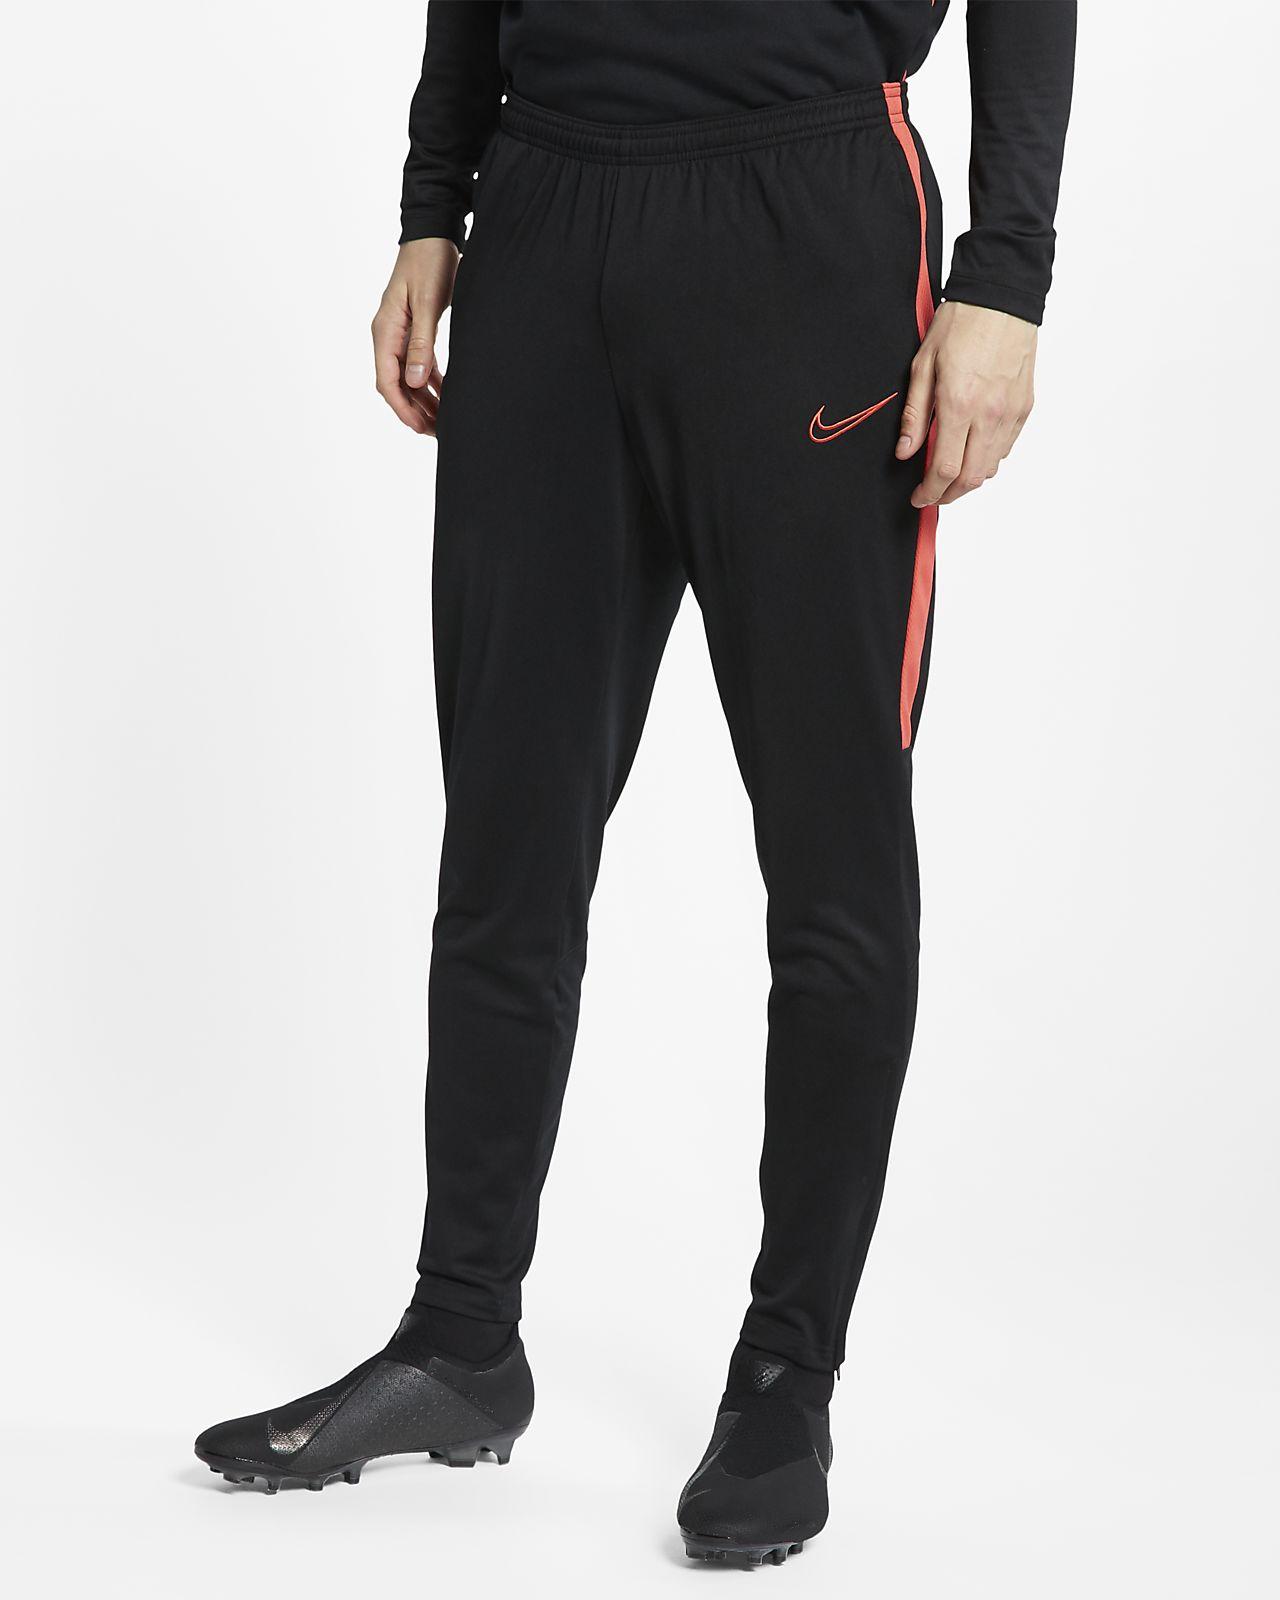 7e53aab4cb Nike Dri-FIT Academy Men's Football Pants. Nike.com IN